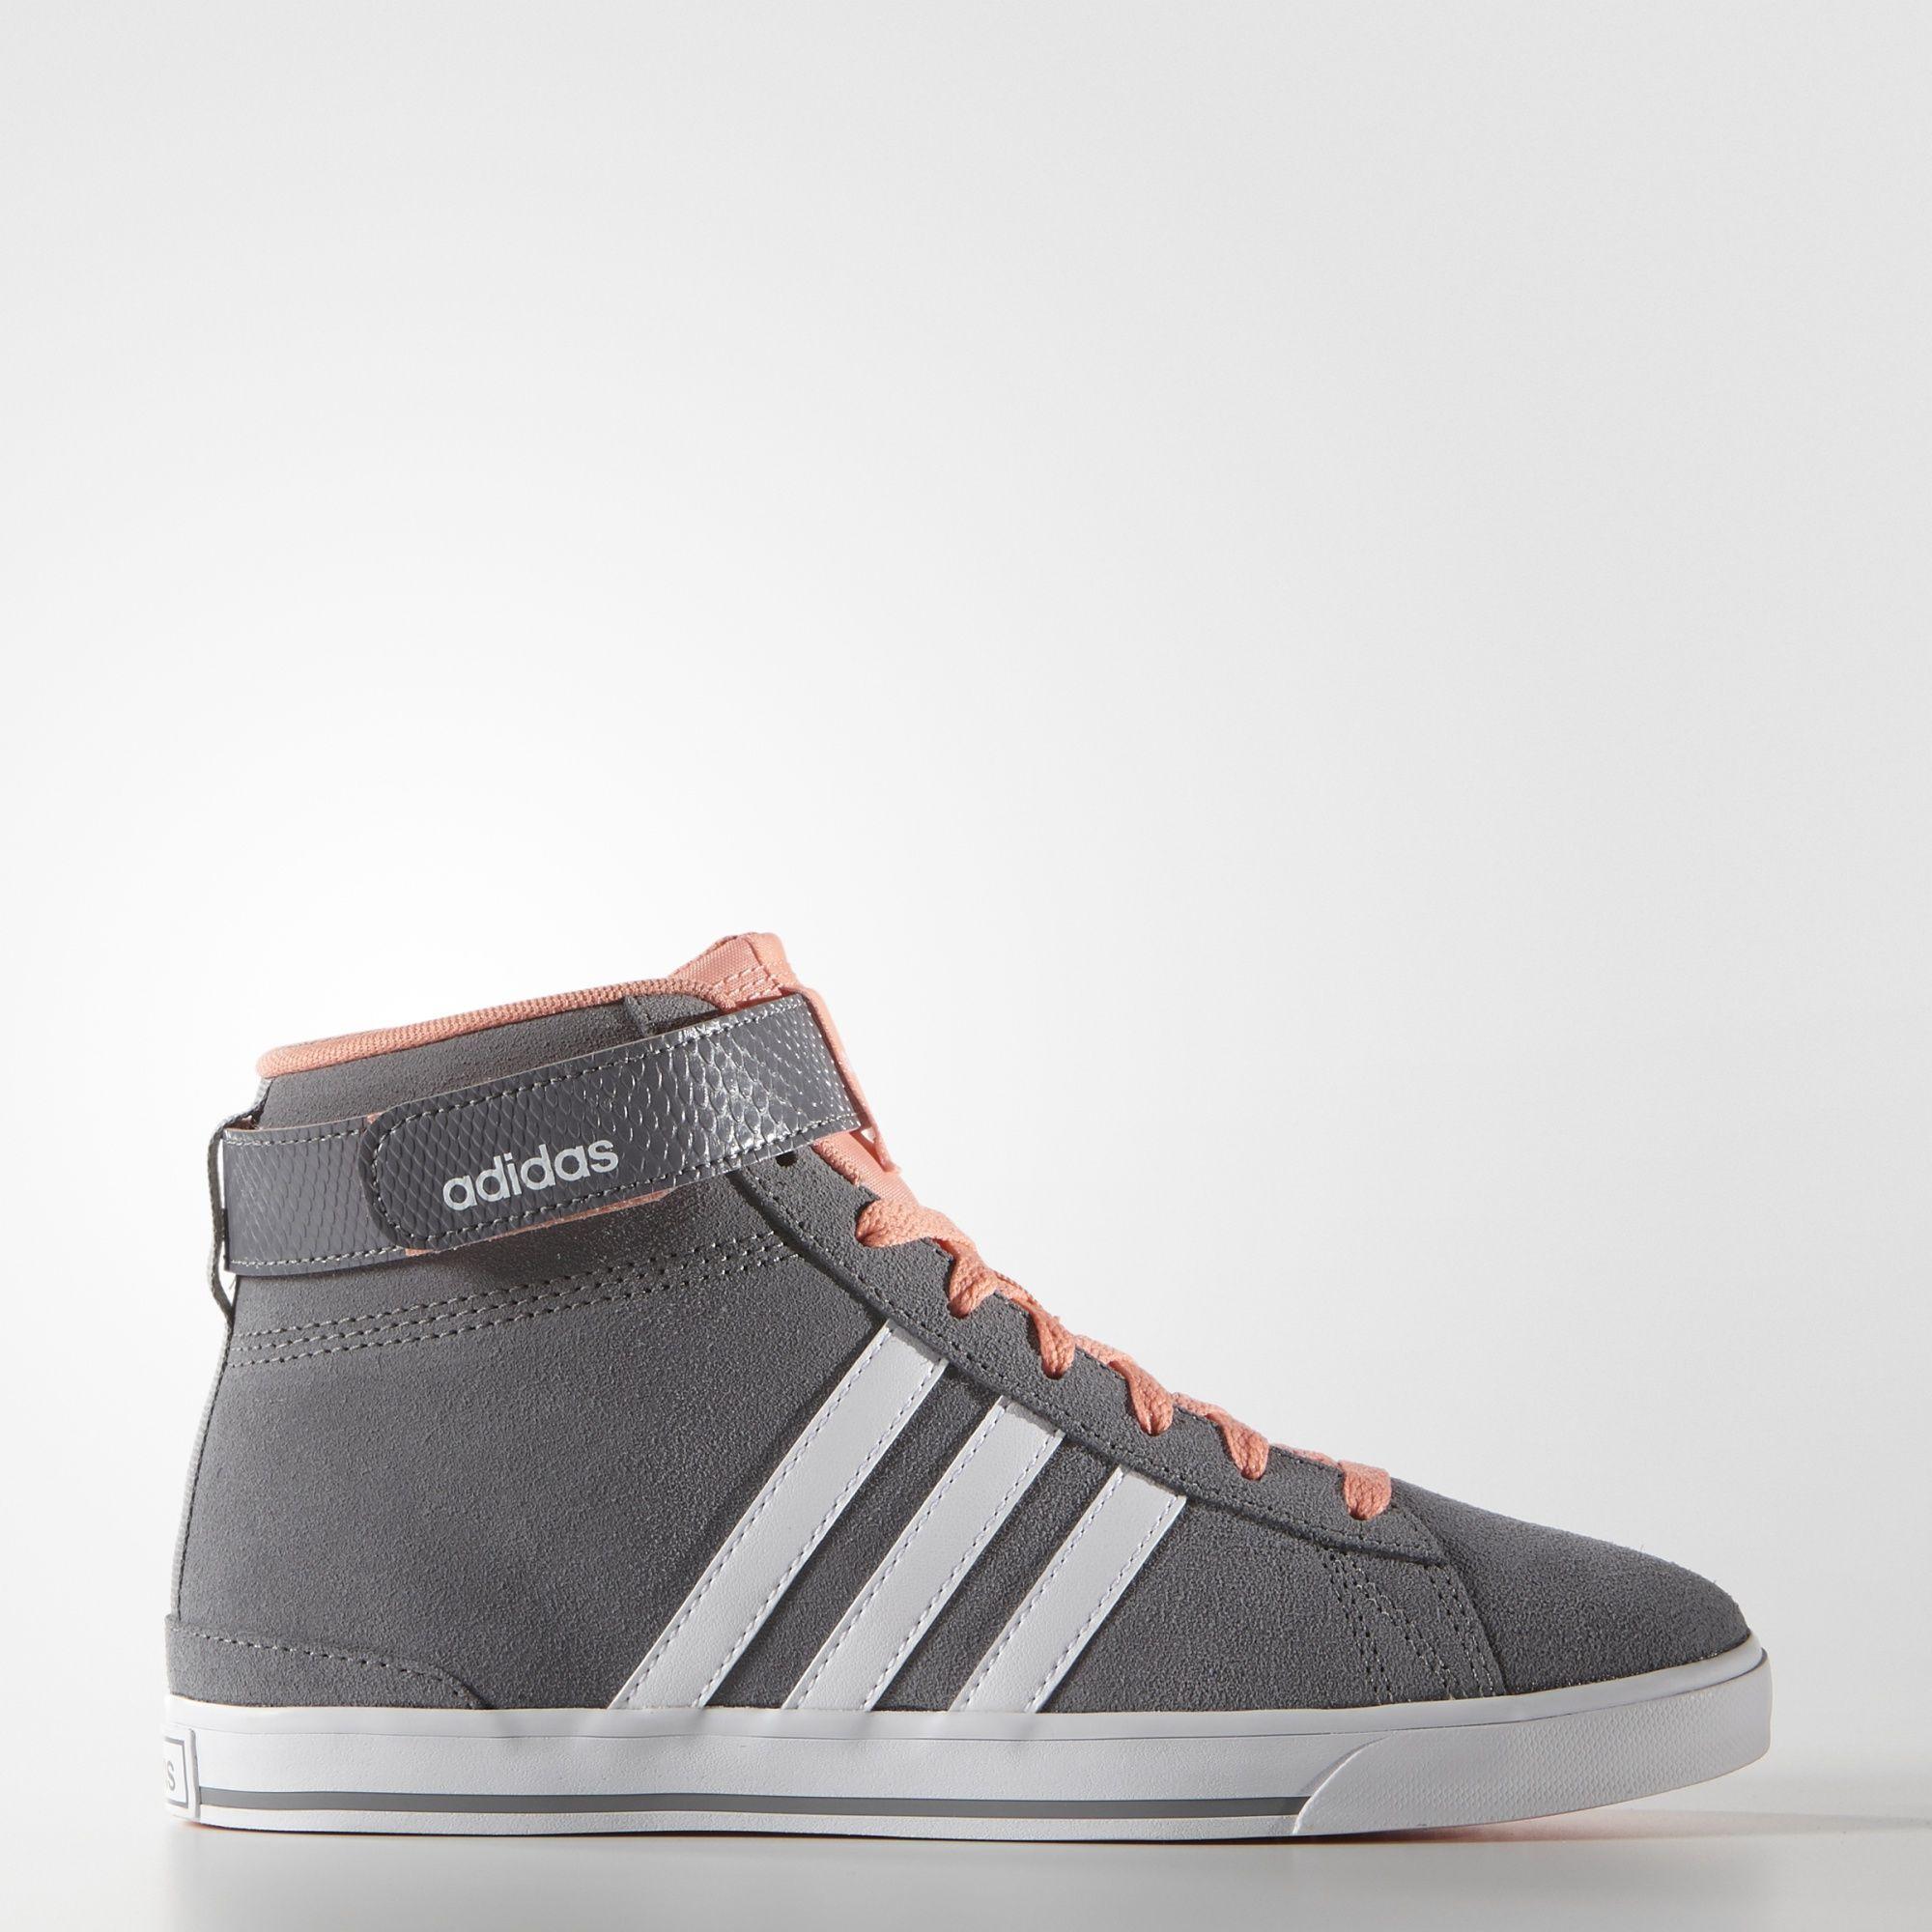 Adidas Neo Womens Bb Neo Daily Twist Mid Trainers Black